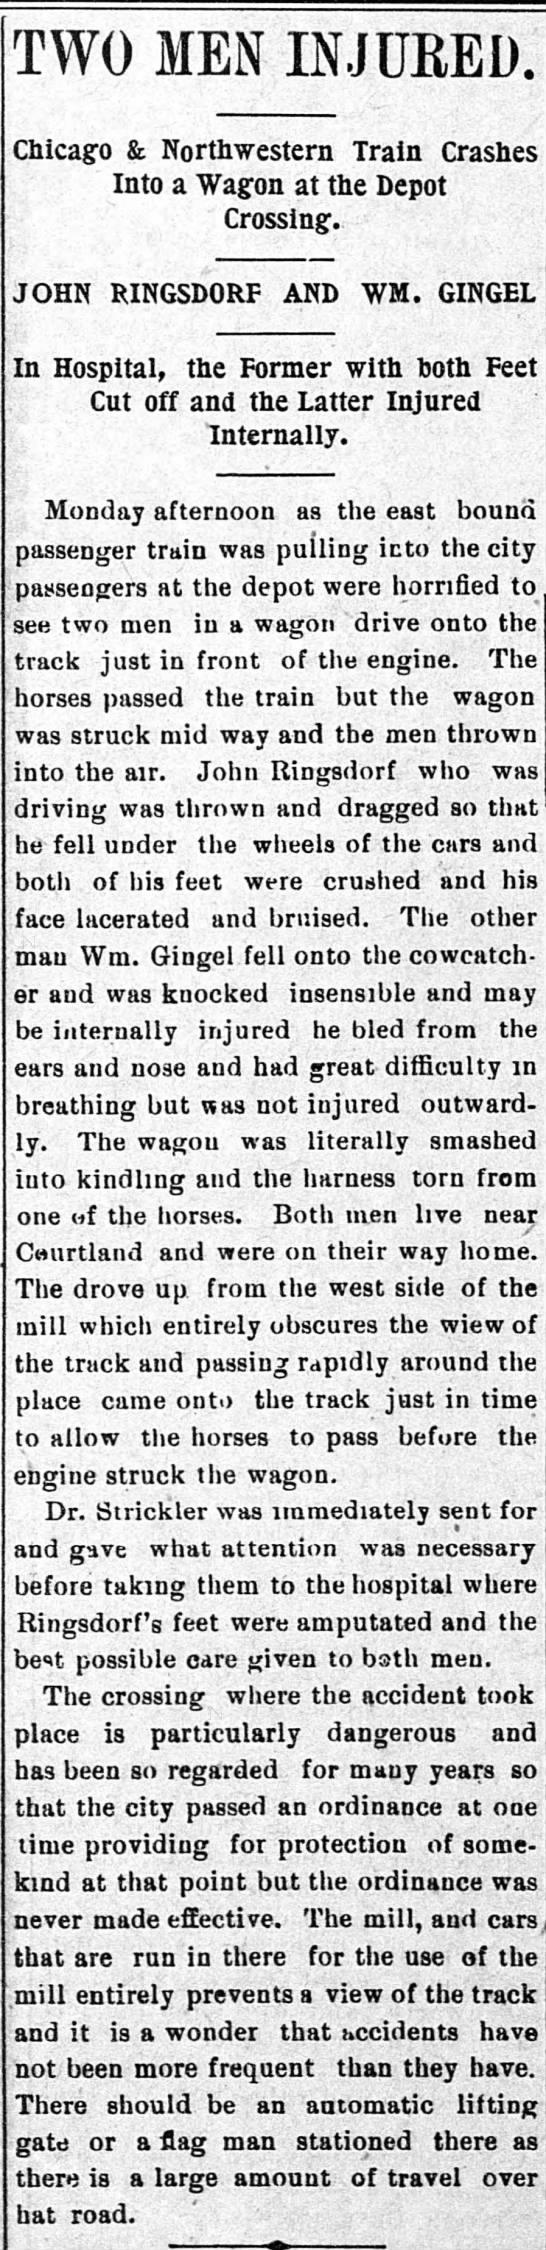 John Ringsdorf and William Gingel train injury -